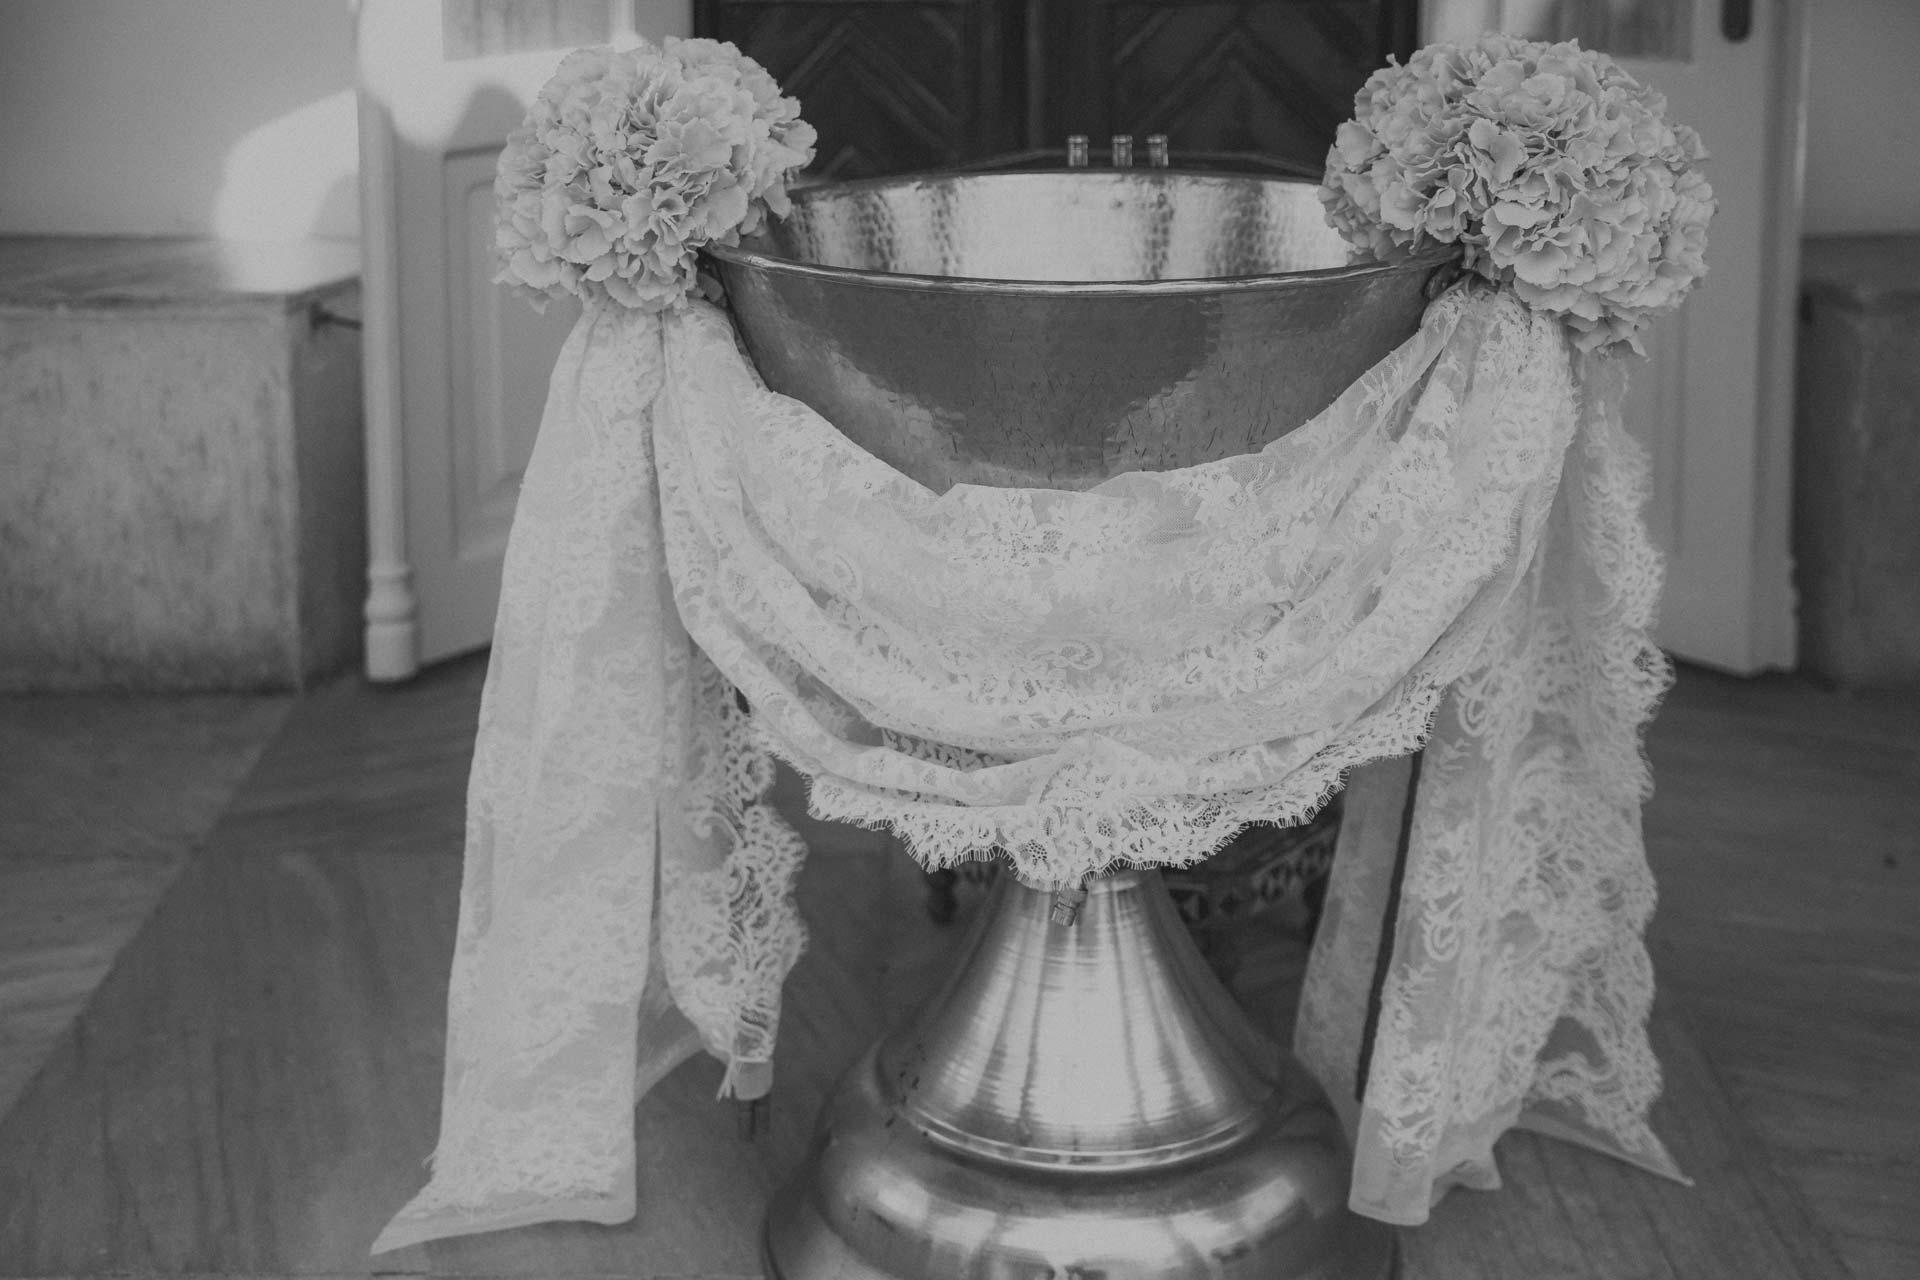 012 PhotoVaptisis βαπτιση σπετσεσ φωτογραφοσ vaptisi koritsi agios nikolaos spestes island photographer bw